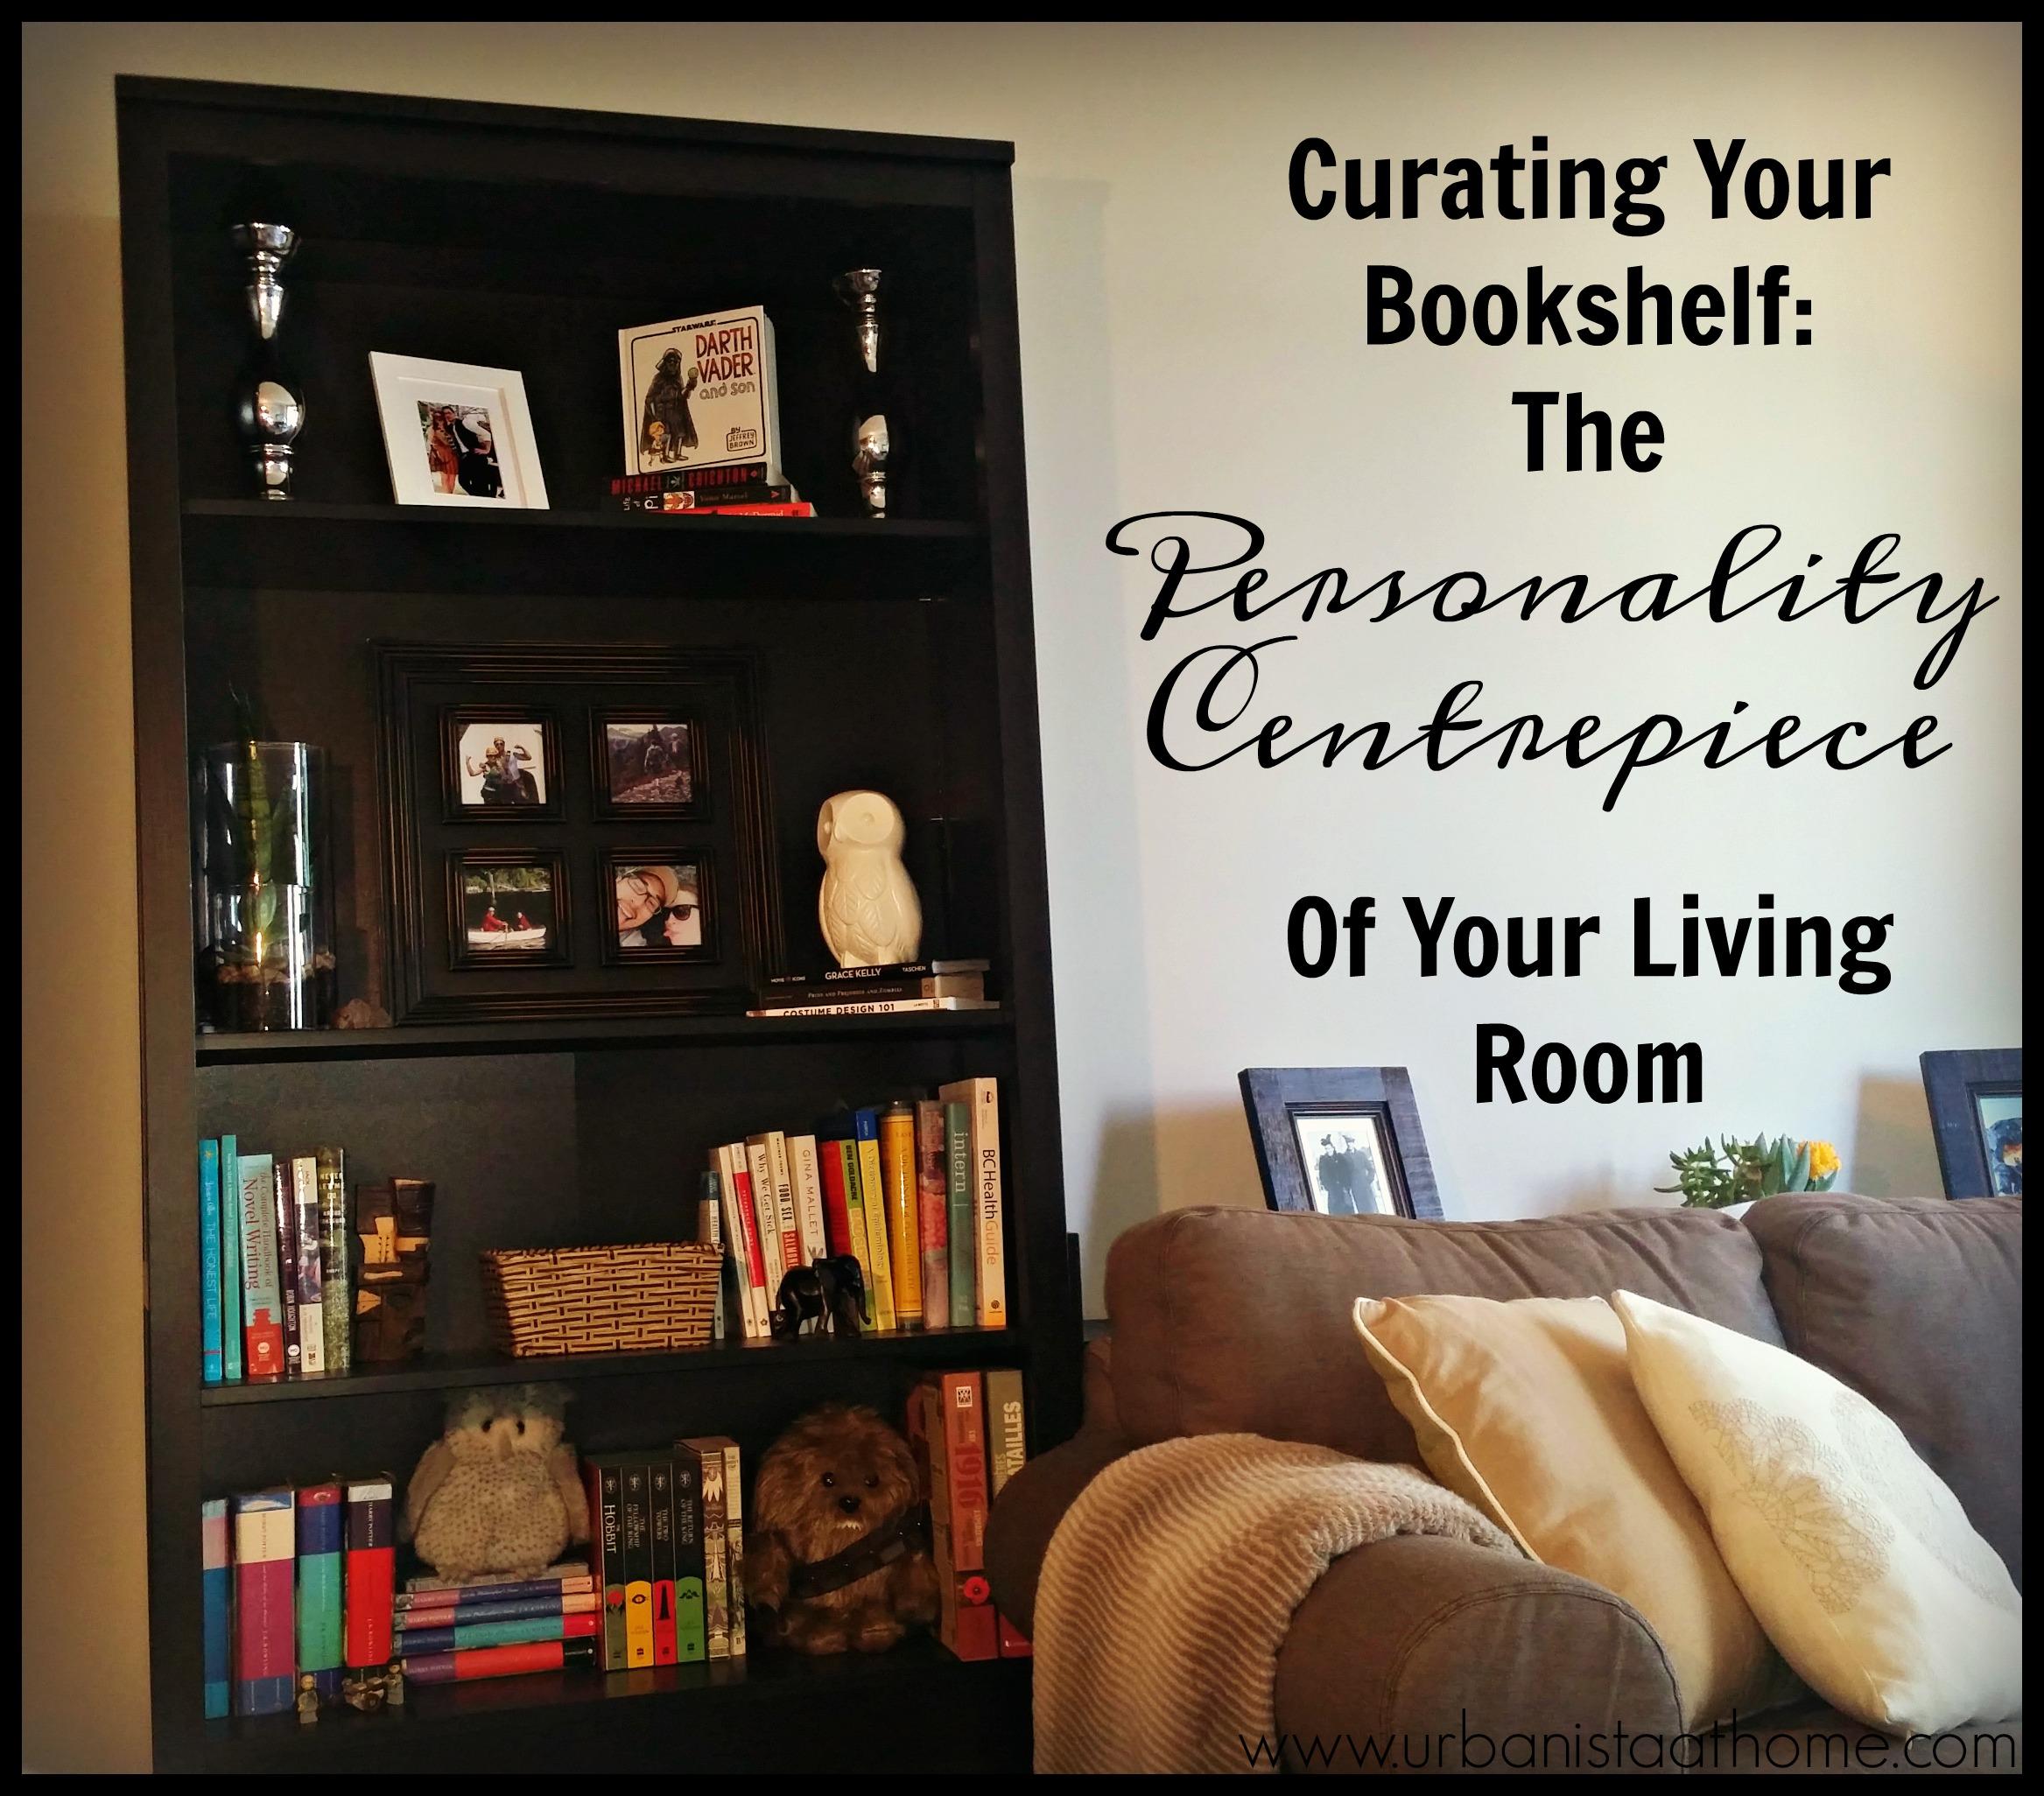 UrbanistaAtHome.com - Curating Your Bookshelf